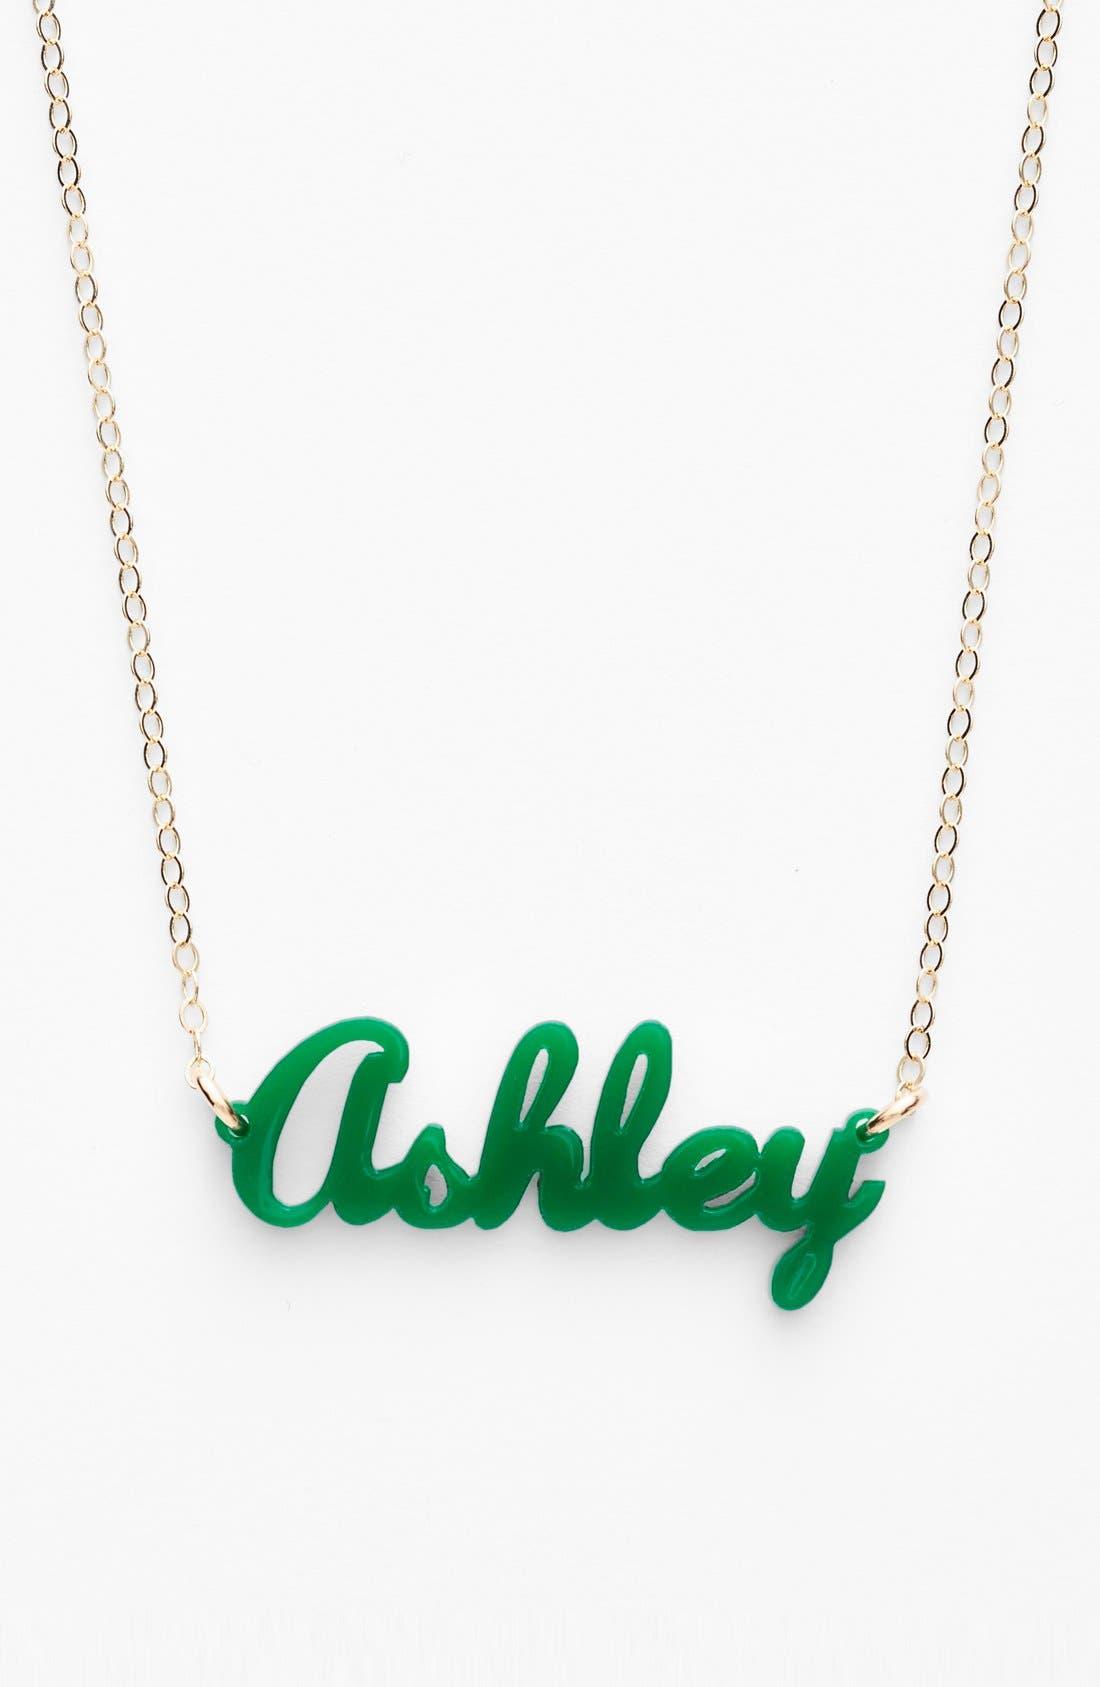 'Script Font' Personalized Nameplate Pendant Necklace,                             Main thumbnail 1, color,                             EMERALD/ GOLD